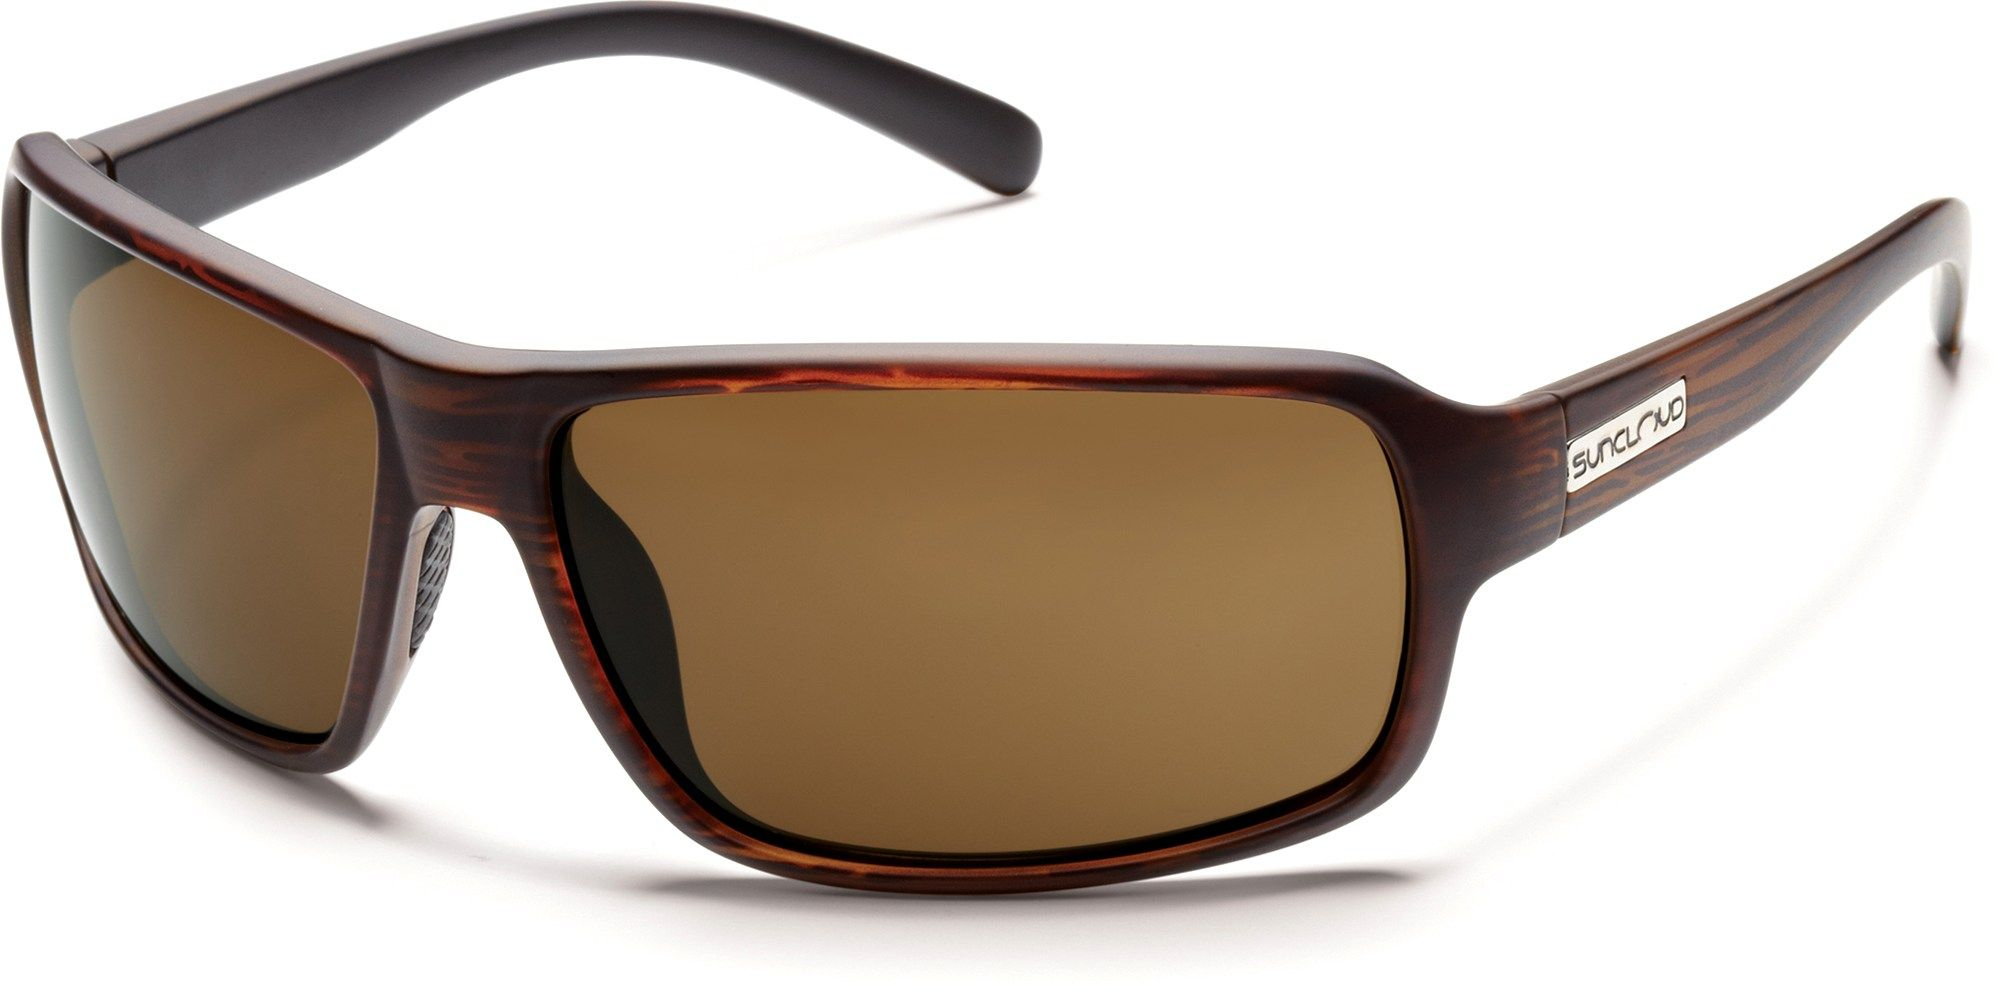 Suncloud Male Tailgate Polarized Sunglasses - Men's